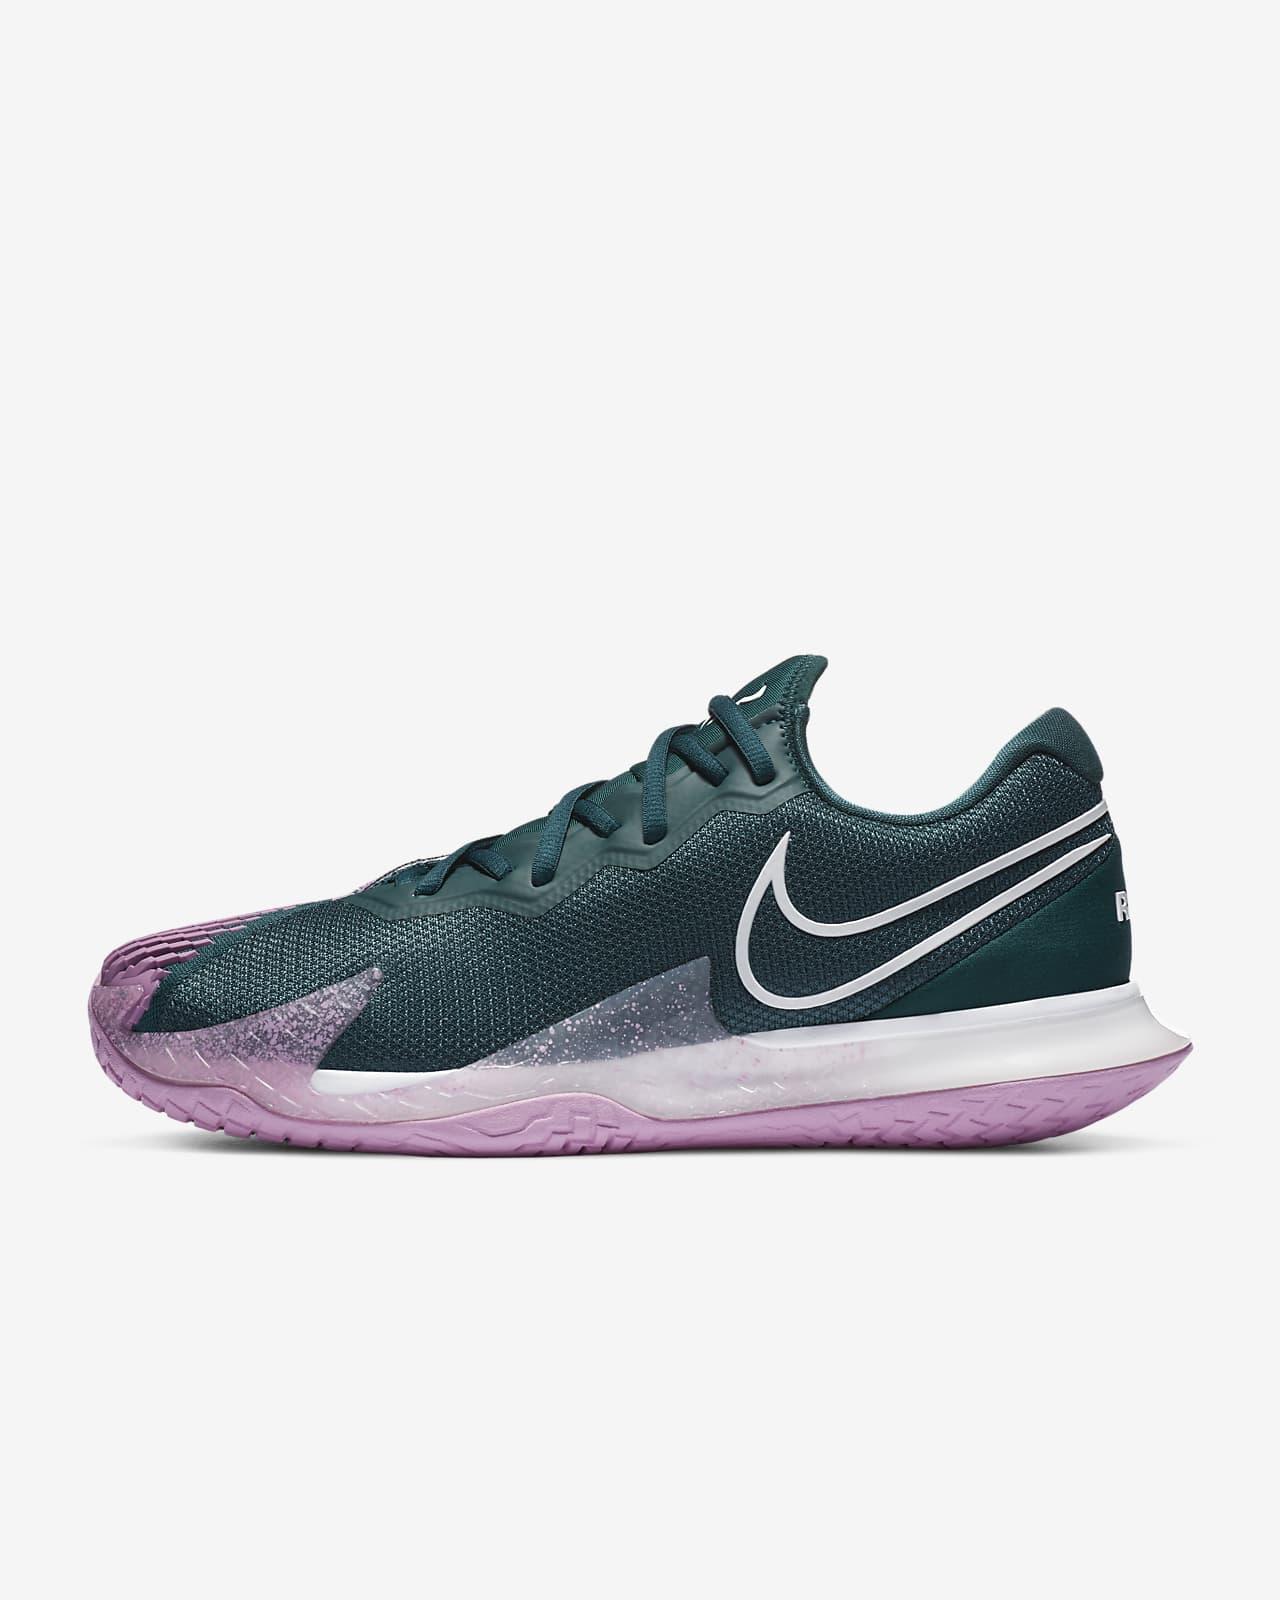 NikeCourt Air Zoom Vapor Cage 4 男款硬地球場網球鞋